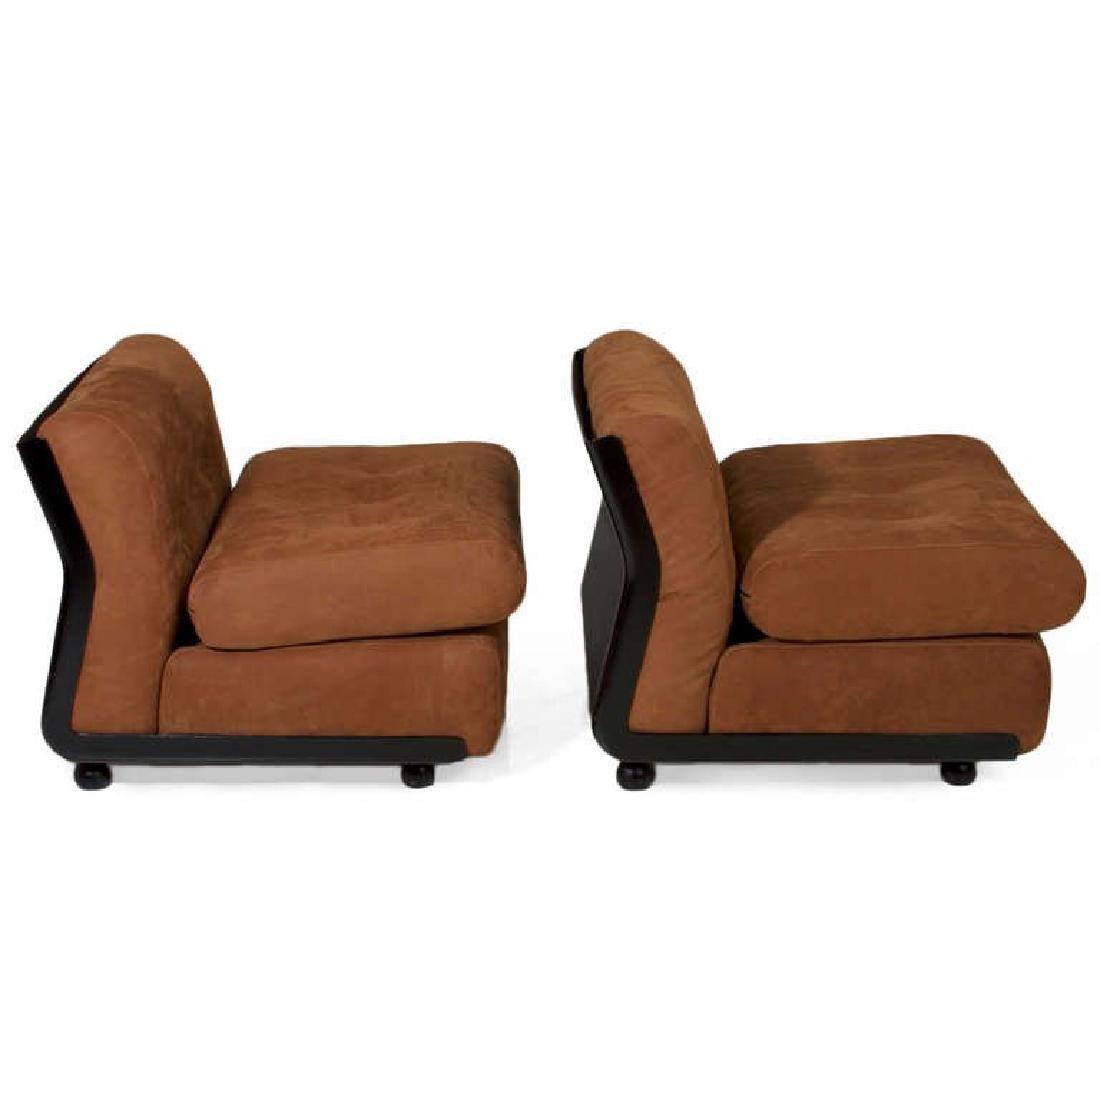 Mario Bellini Amanta Chairs (2) - 3